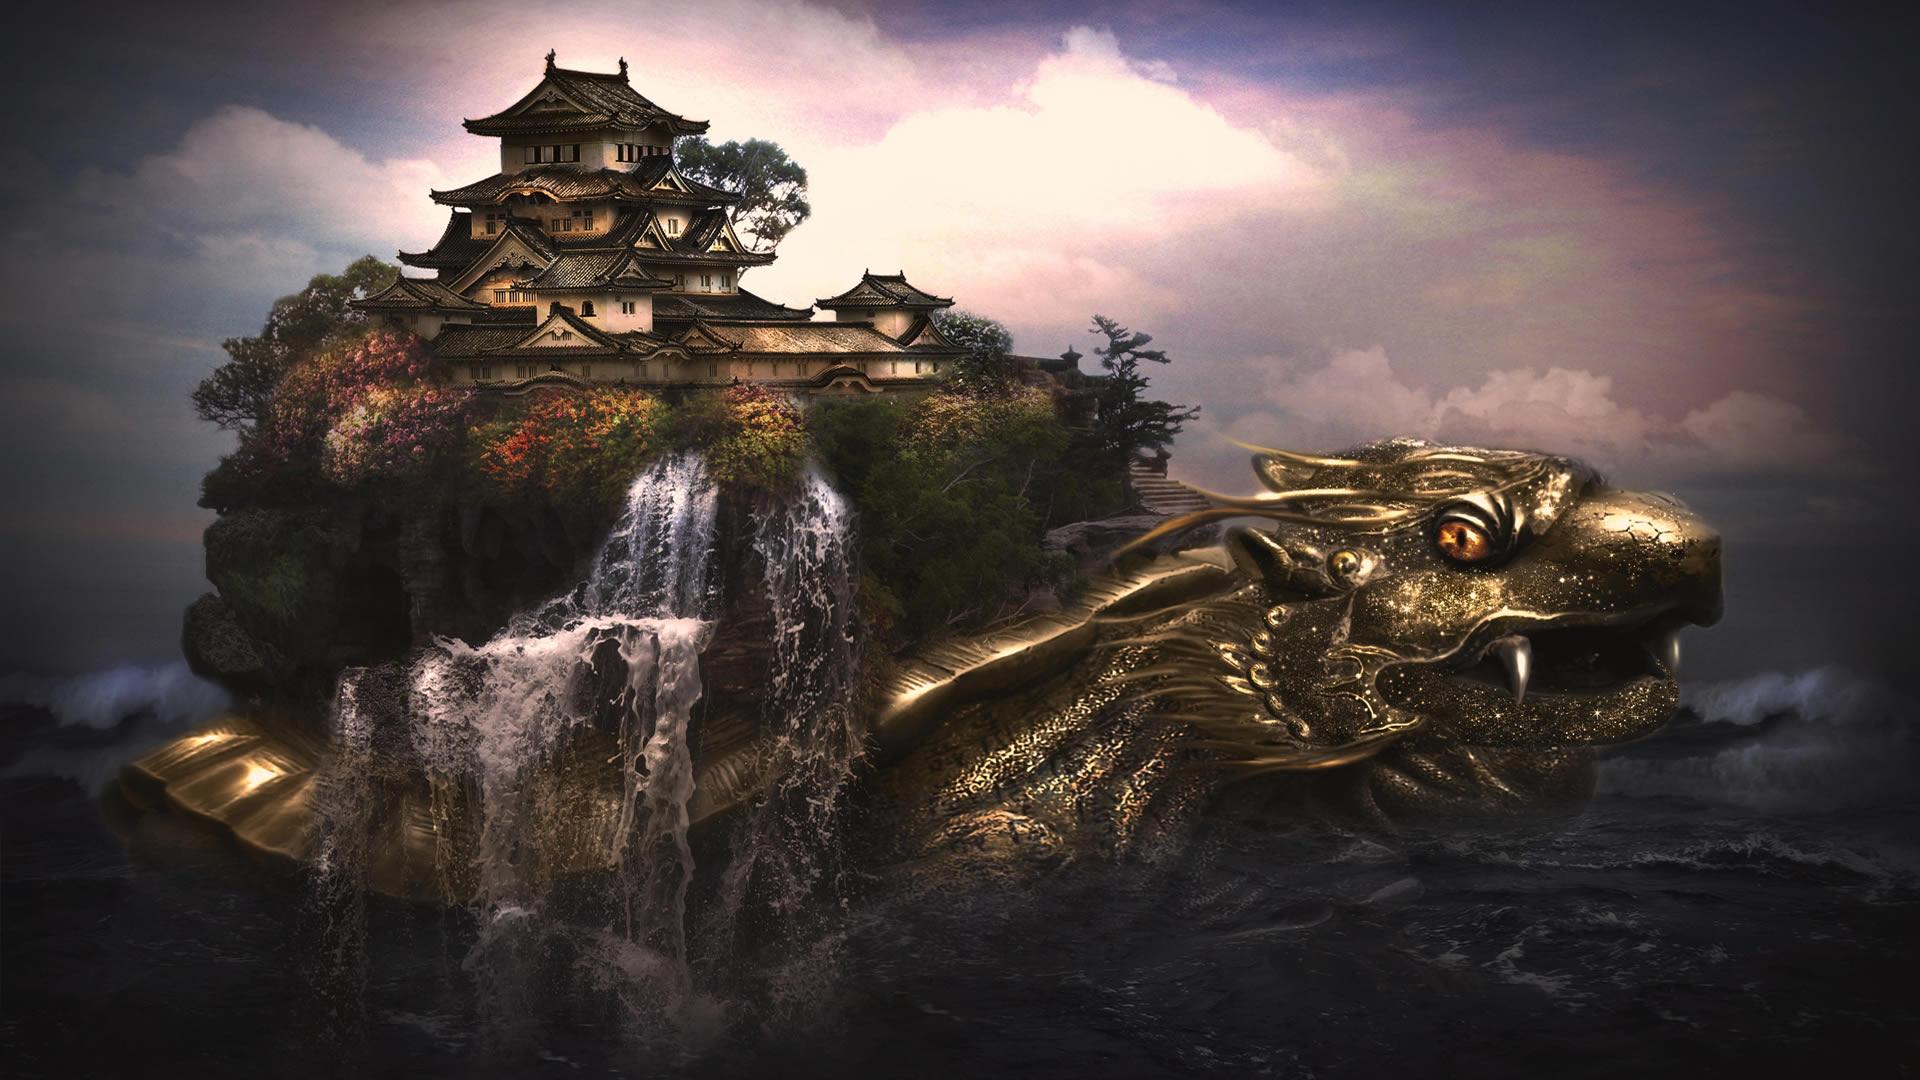 Fantasy wallpaper of the week 9   3D FantasyCoolvibe Digital Art 1920x1080